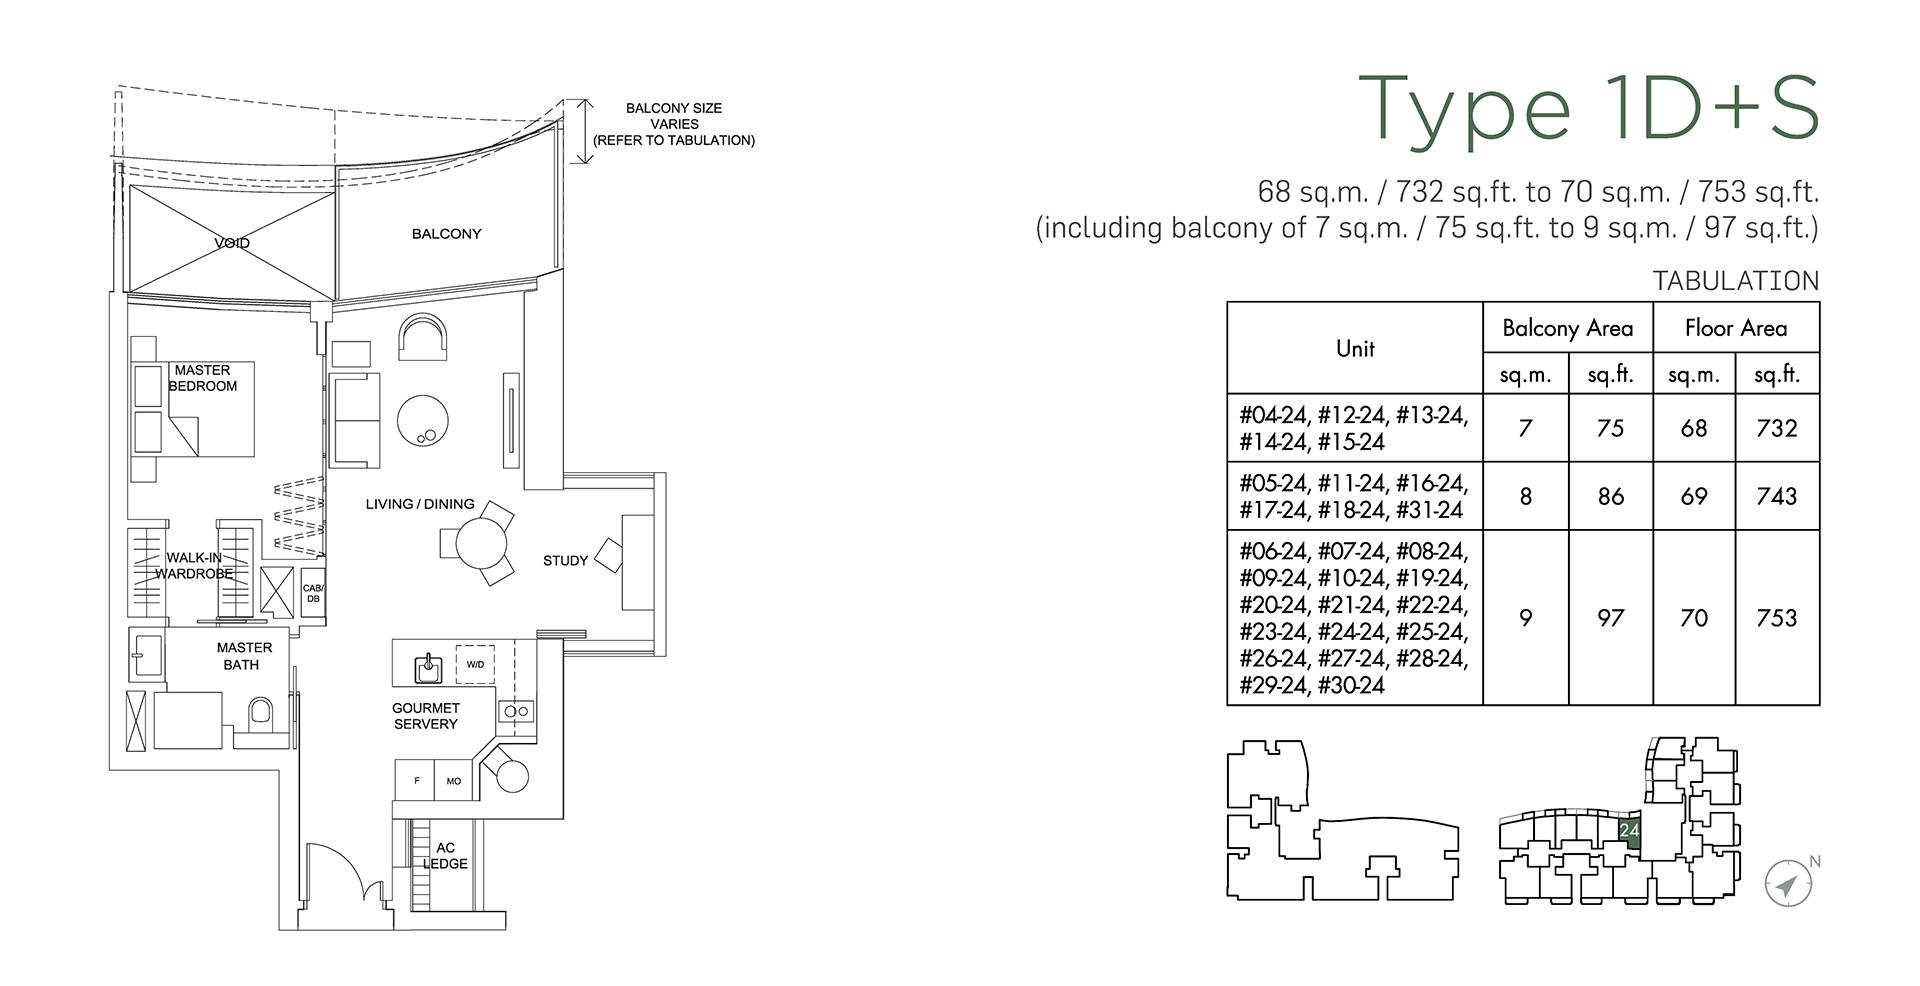 Marina One Residences Floor Plan 1 Bedroom + Study Type1D+S